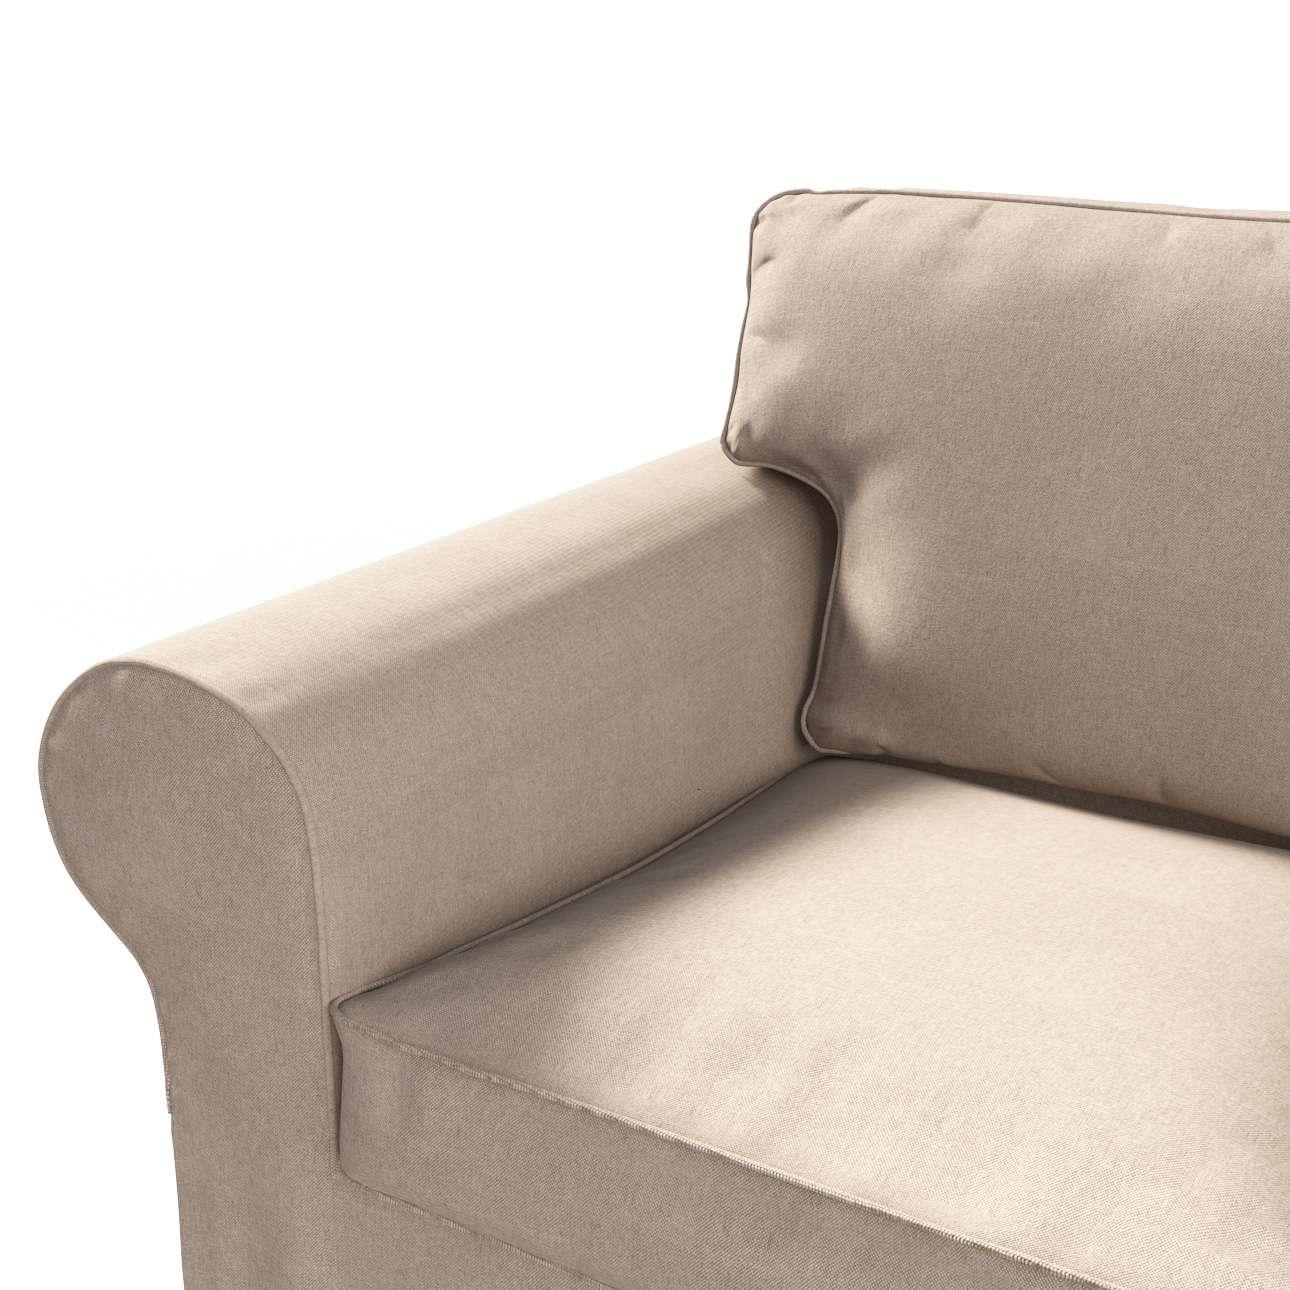 Ektorp 2-Sitzer Schlafsofabezug ALTES Modell Sofabezug Ektorp 2-Sitzer Schlafsofa altes Modell von der Kollektion Etna, Stoff: 705-09